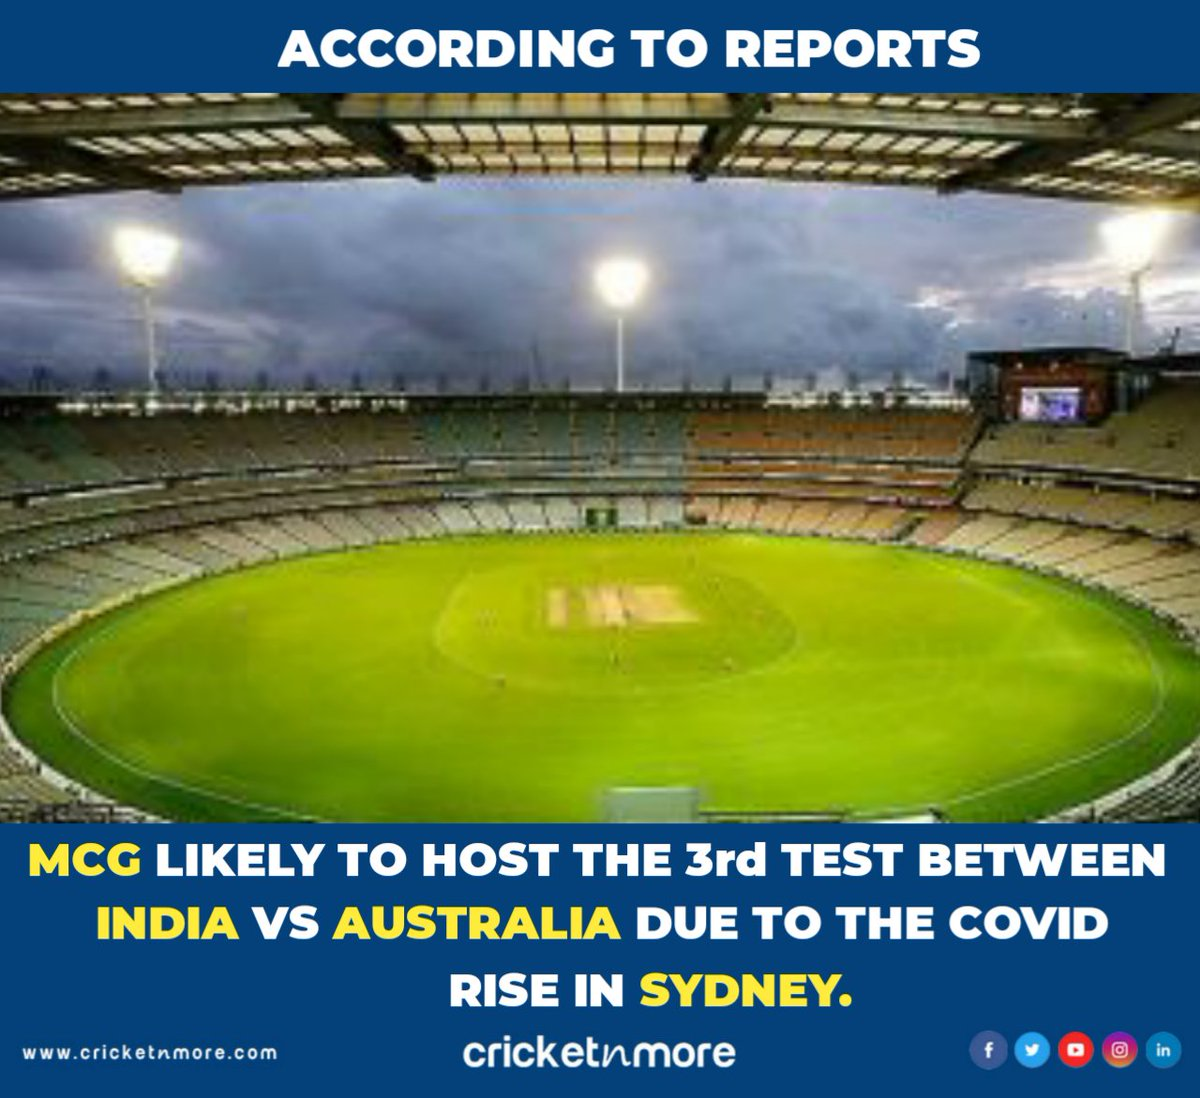 Melbourne Might Host The 3rd Test! . . #IndianCricket #TeamIndia #Aussie #AustraliaCricket #AUSvIND #NZVWI #SAvENG #mcg #scg